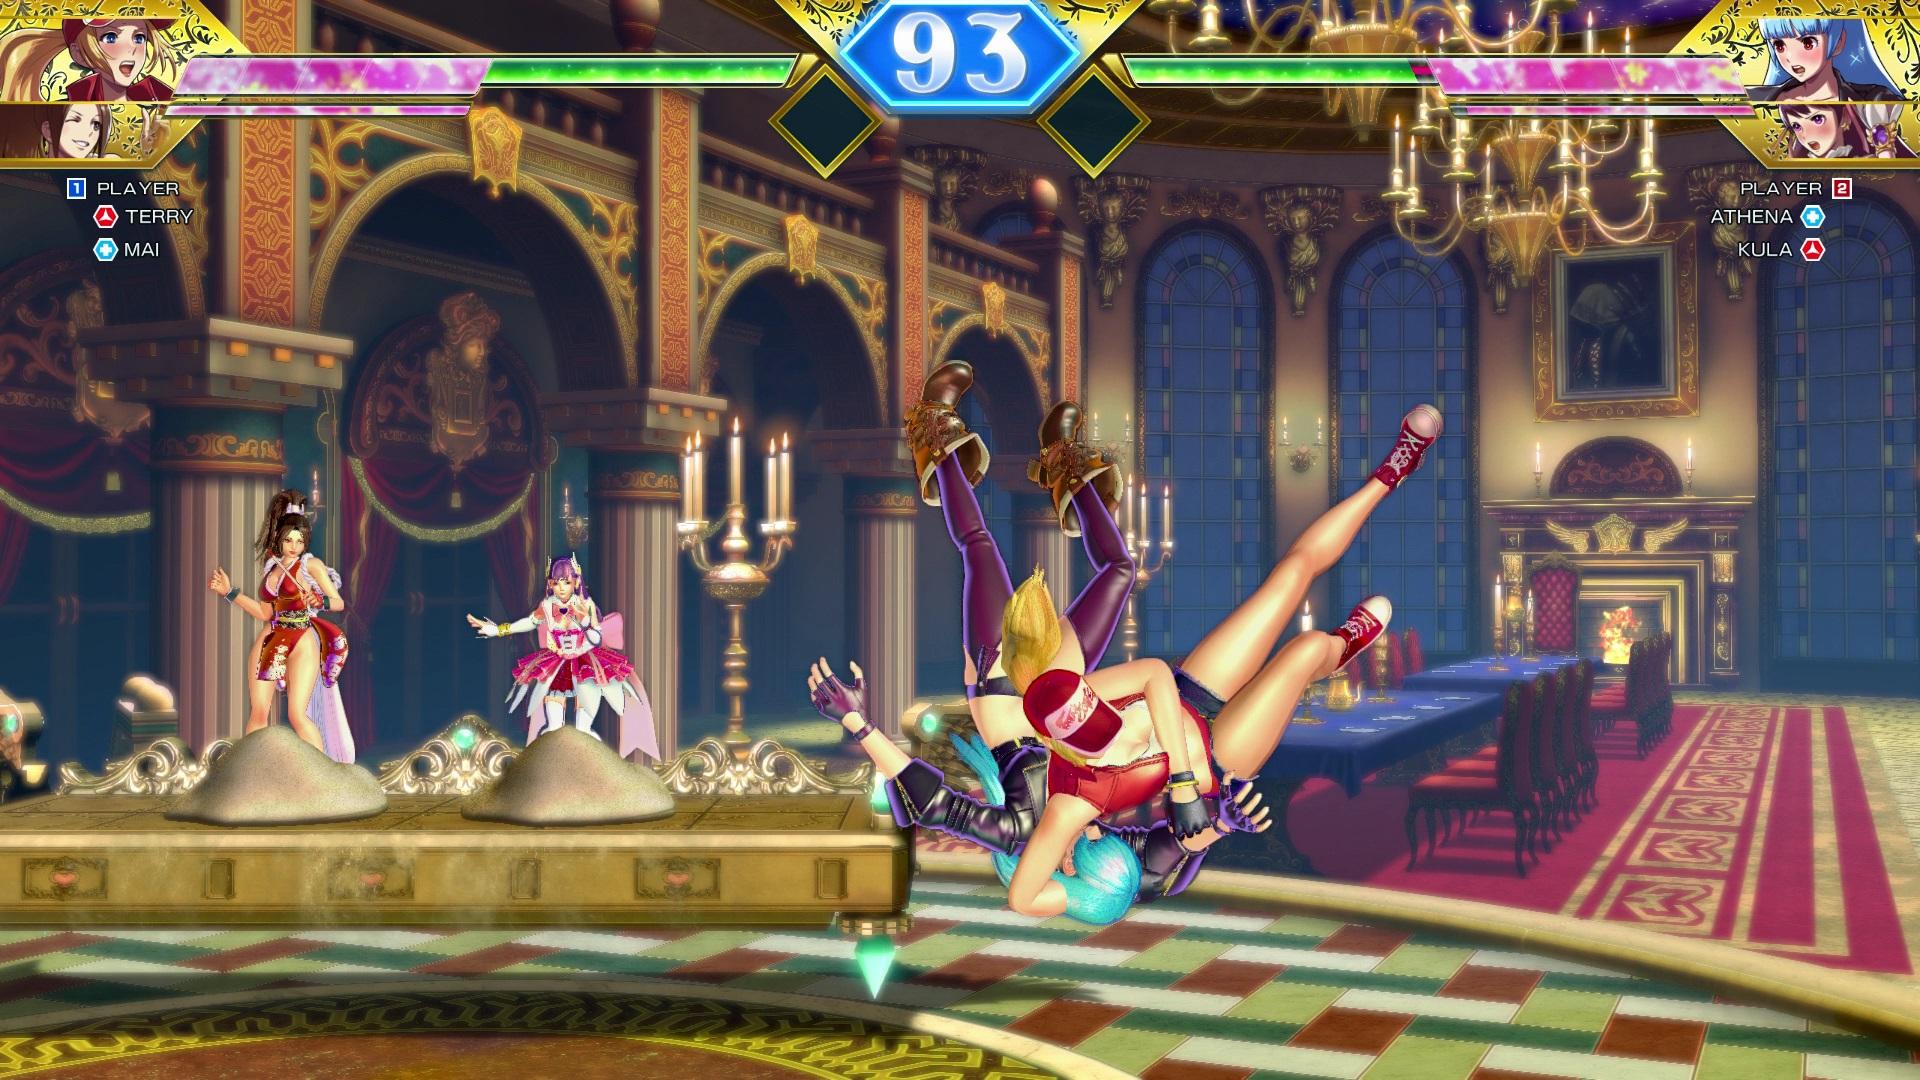 snk-heroines-tag-team-frenzy-pc-screenshot-2